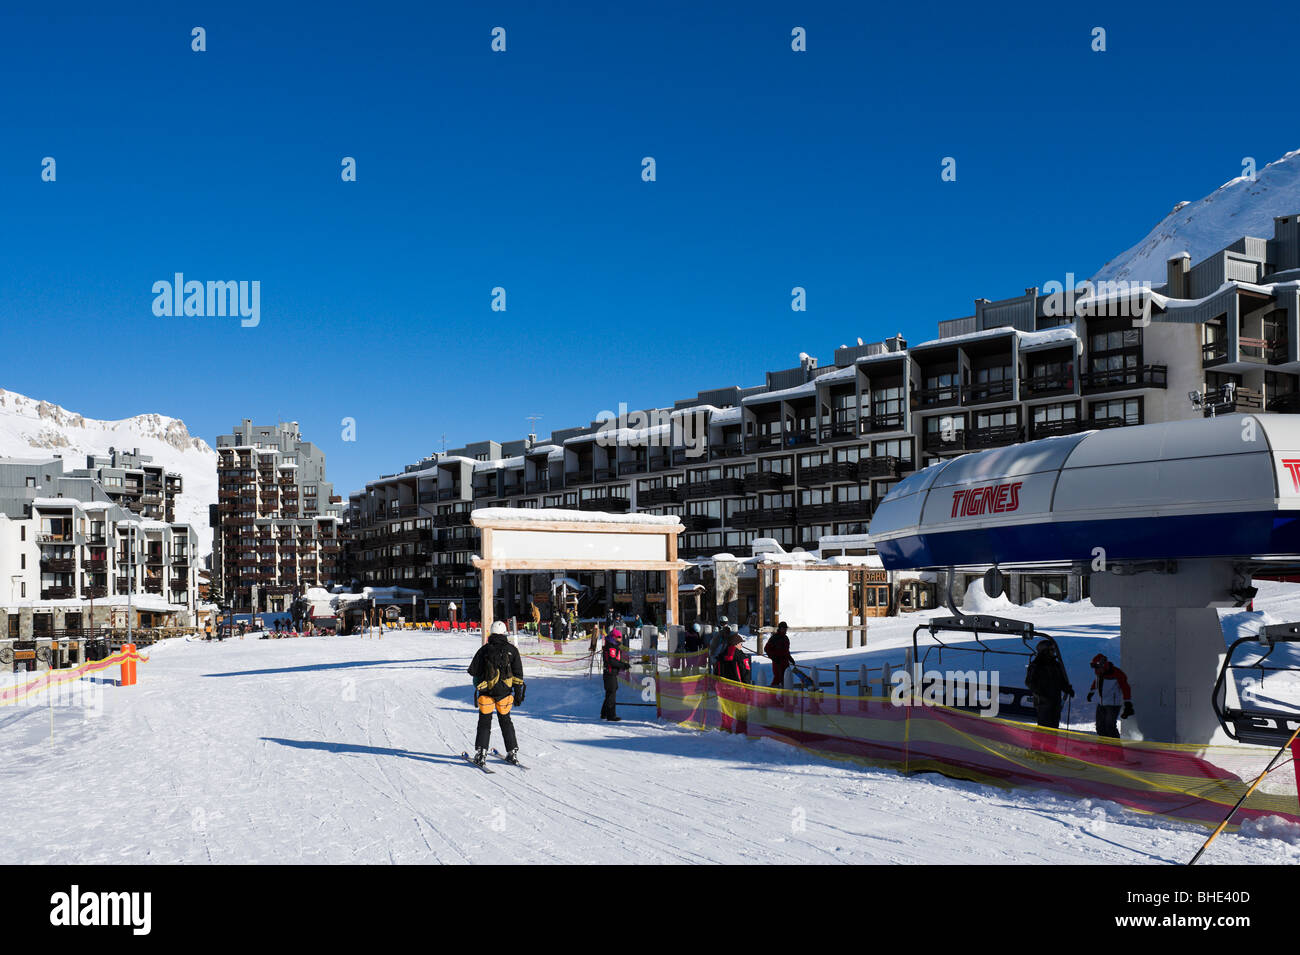 Ski lift in the centre of Val Claret, Tignes, Espace Killy, Tarentaise, Savoie, France - Stock Image